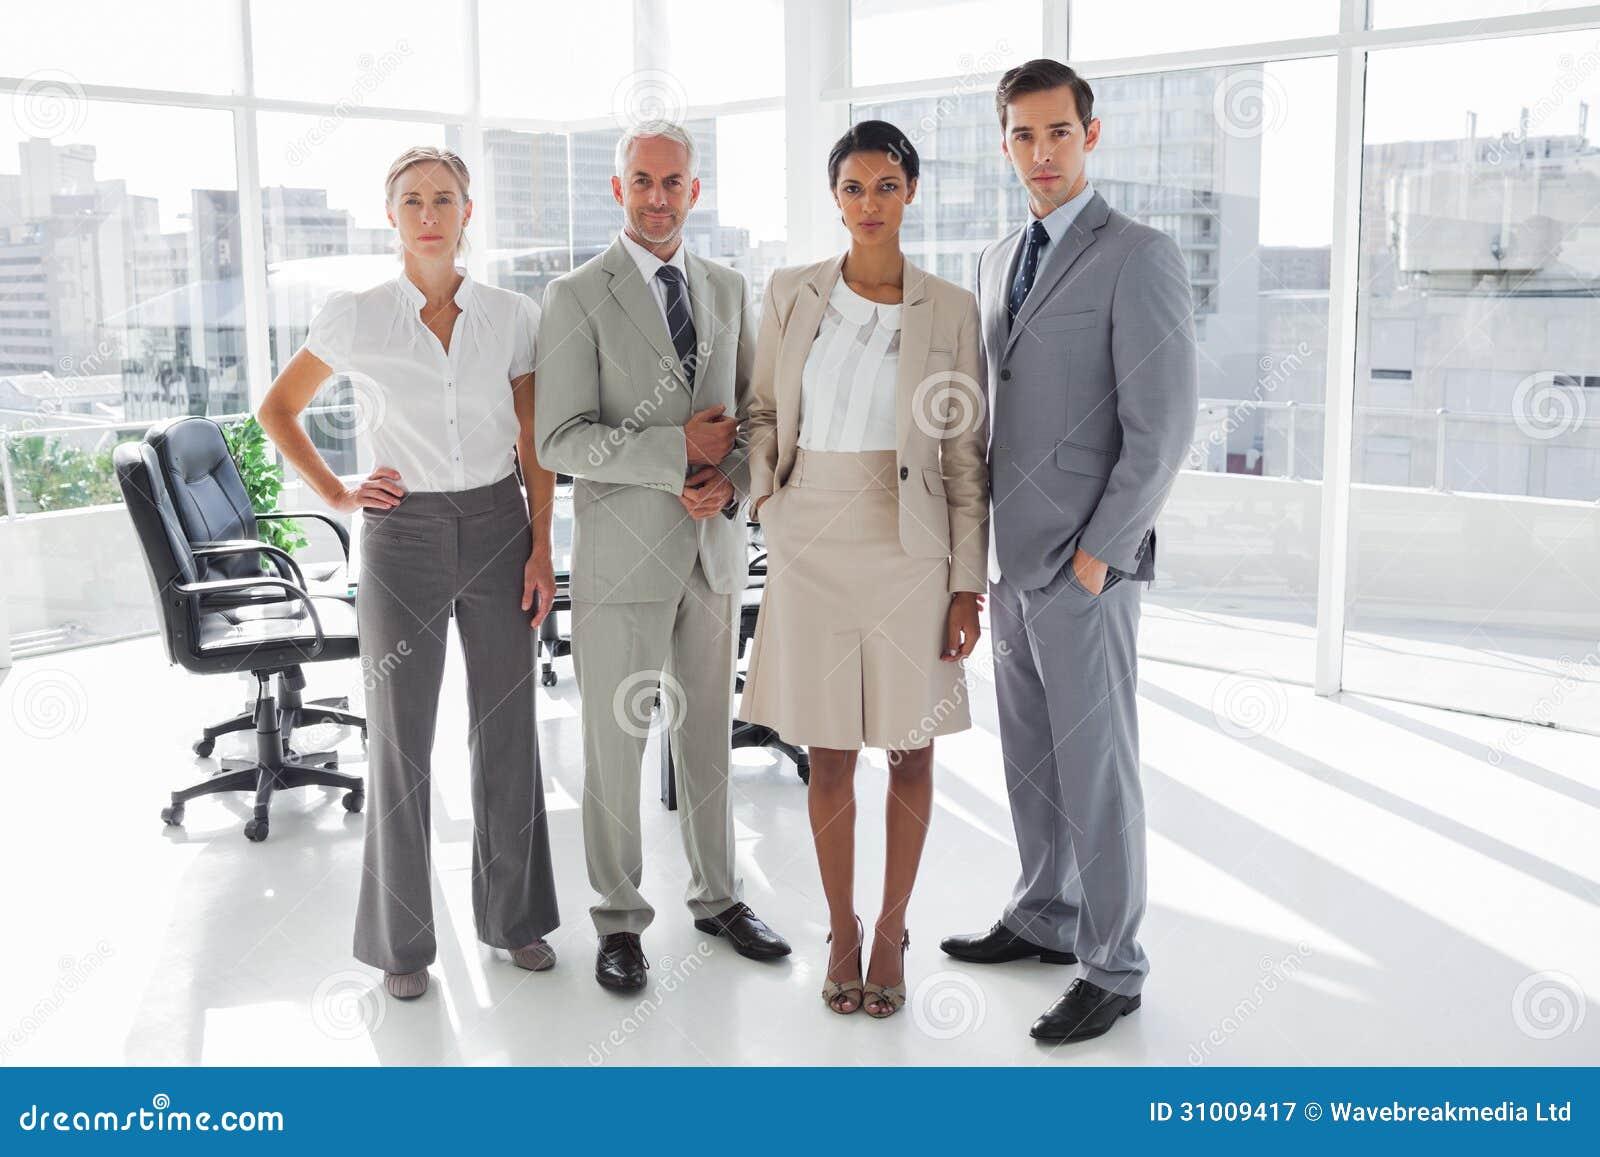 Free Standing Meeting Room